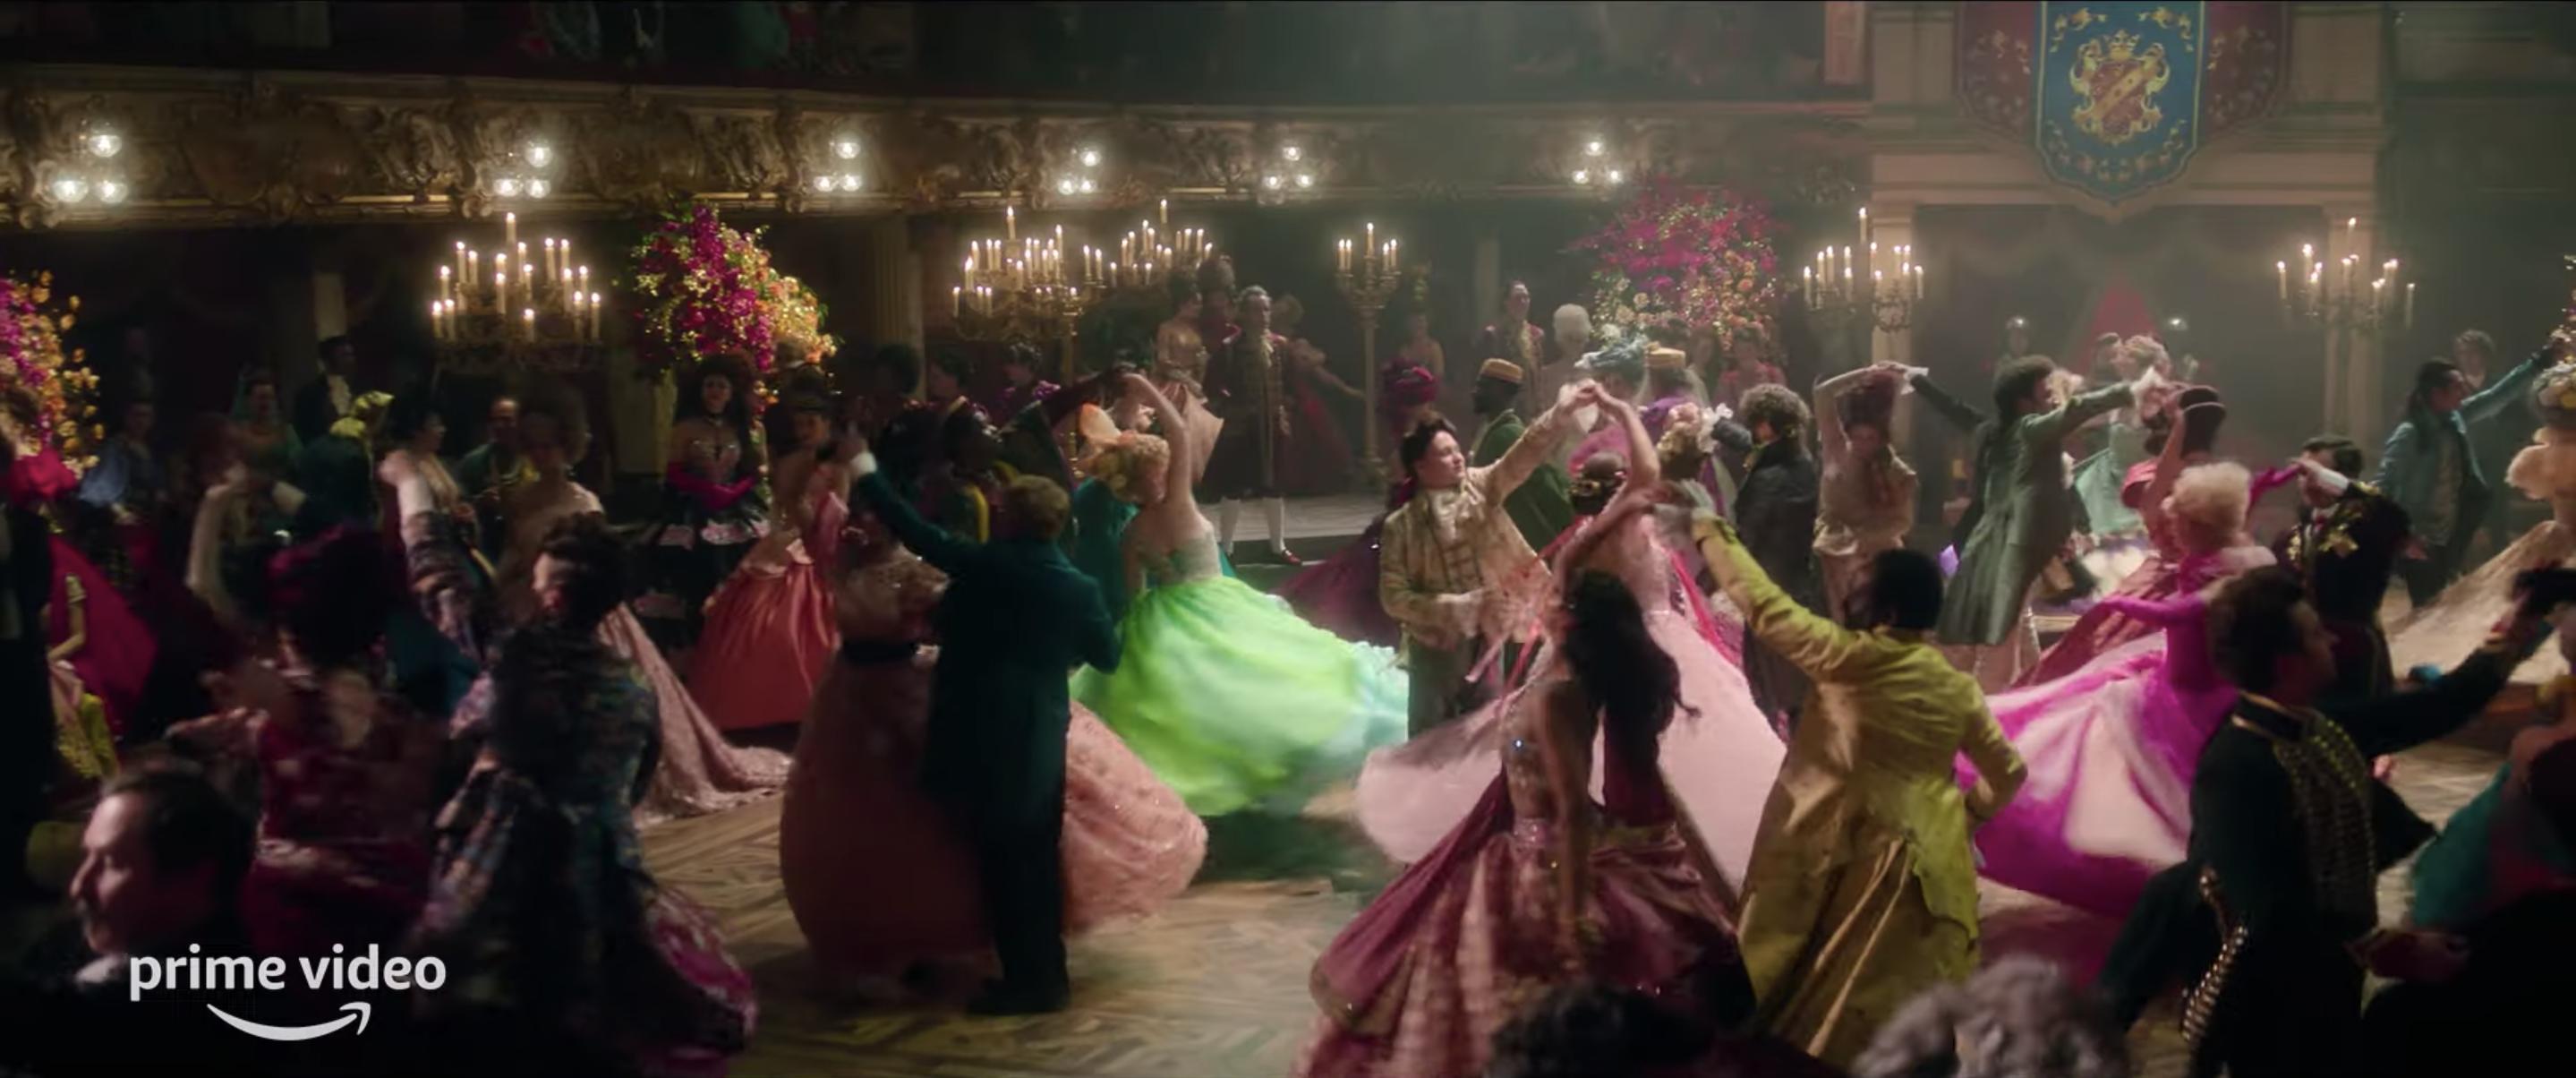 "A romantic ball scene on the set of Amazon Prime Video's ""Cinderella"""